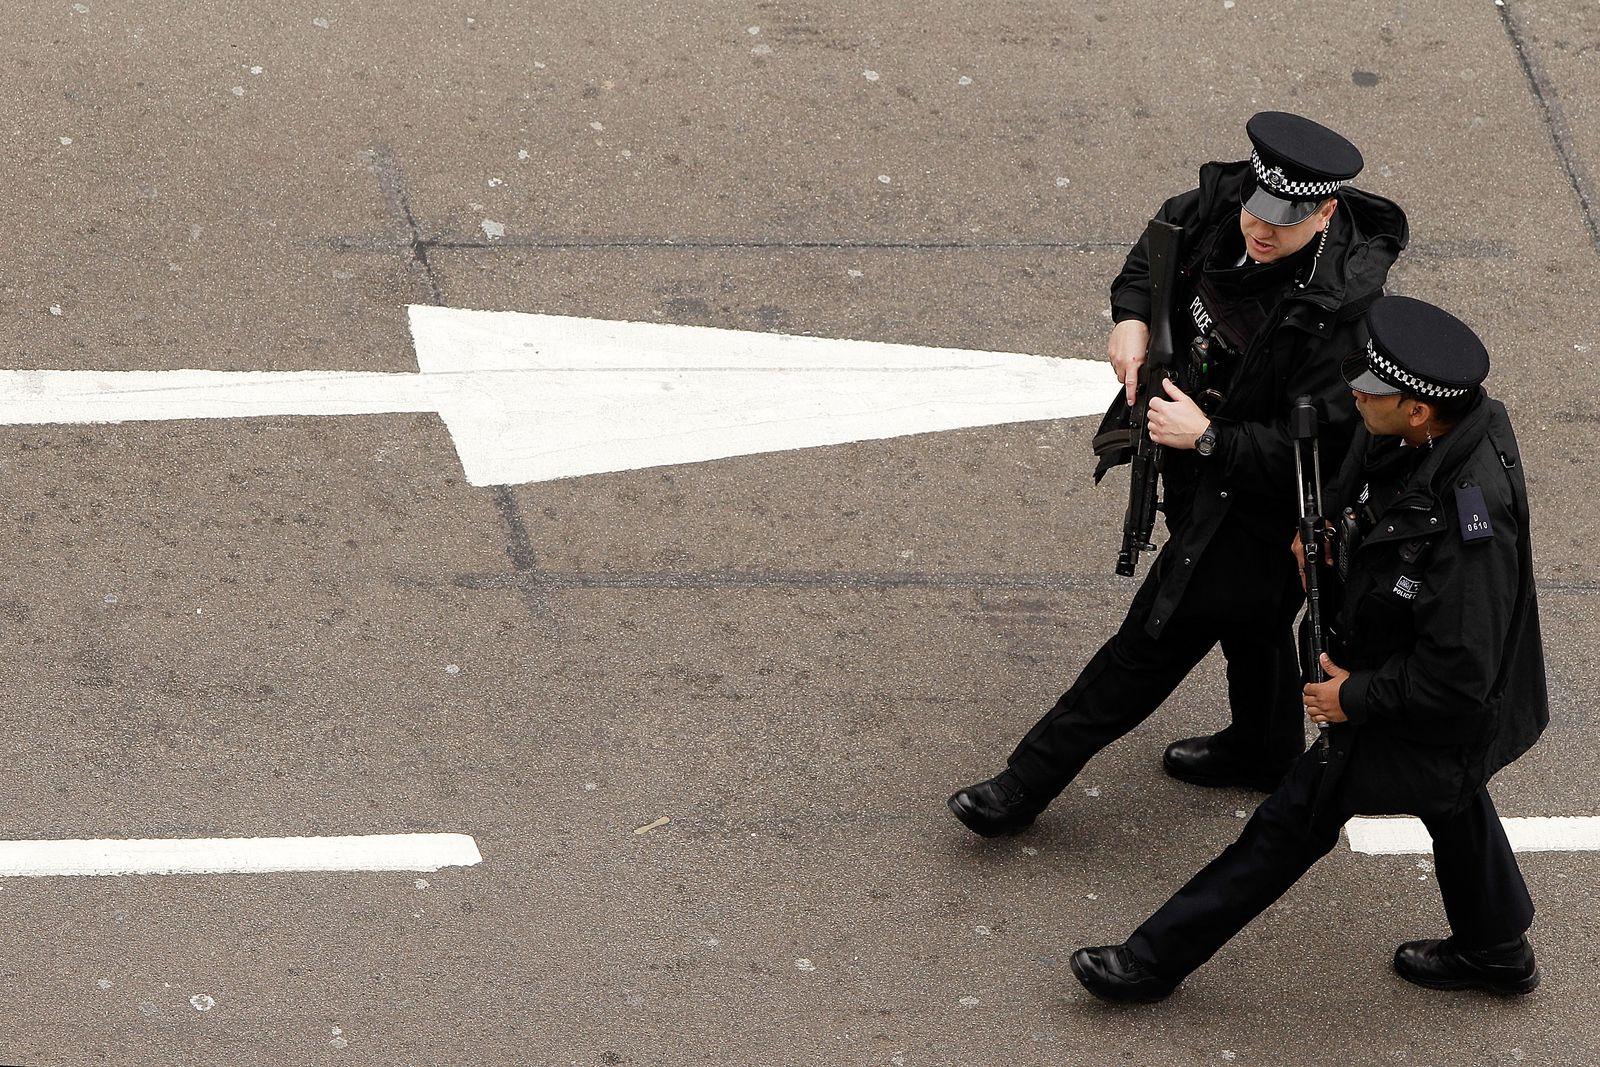 London/ Polizisten